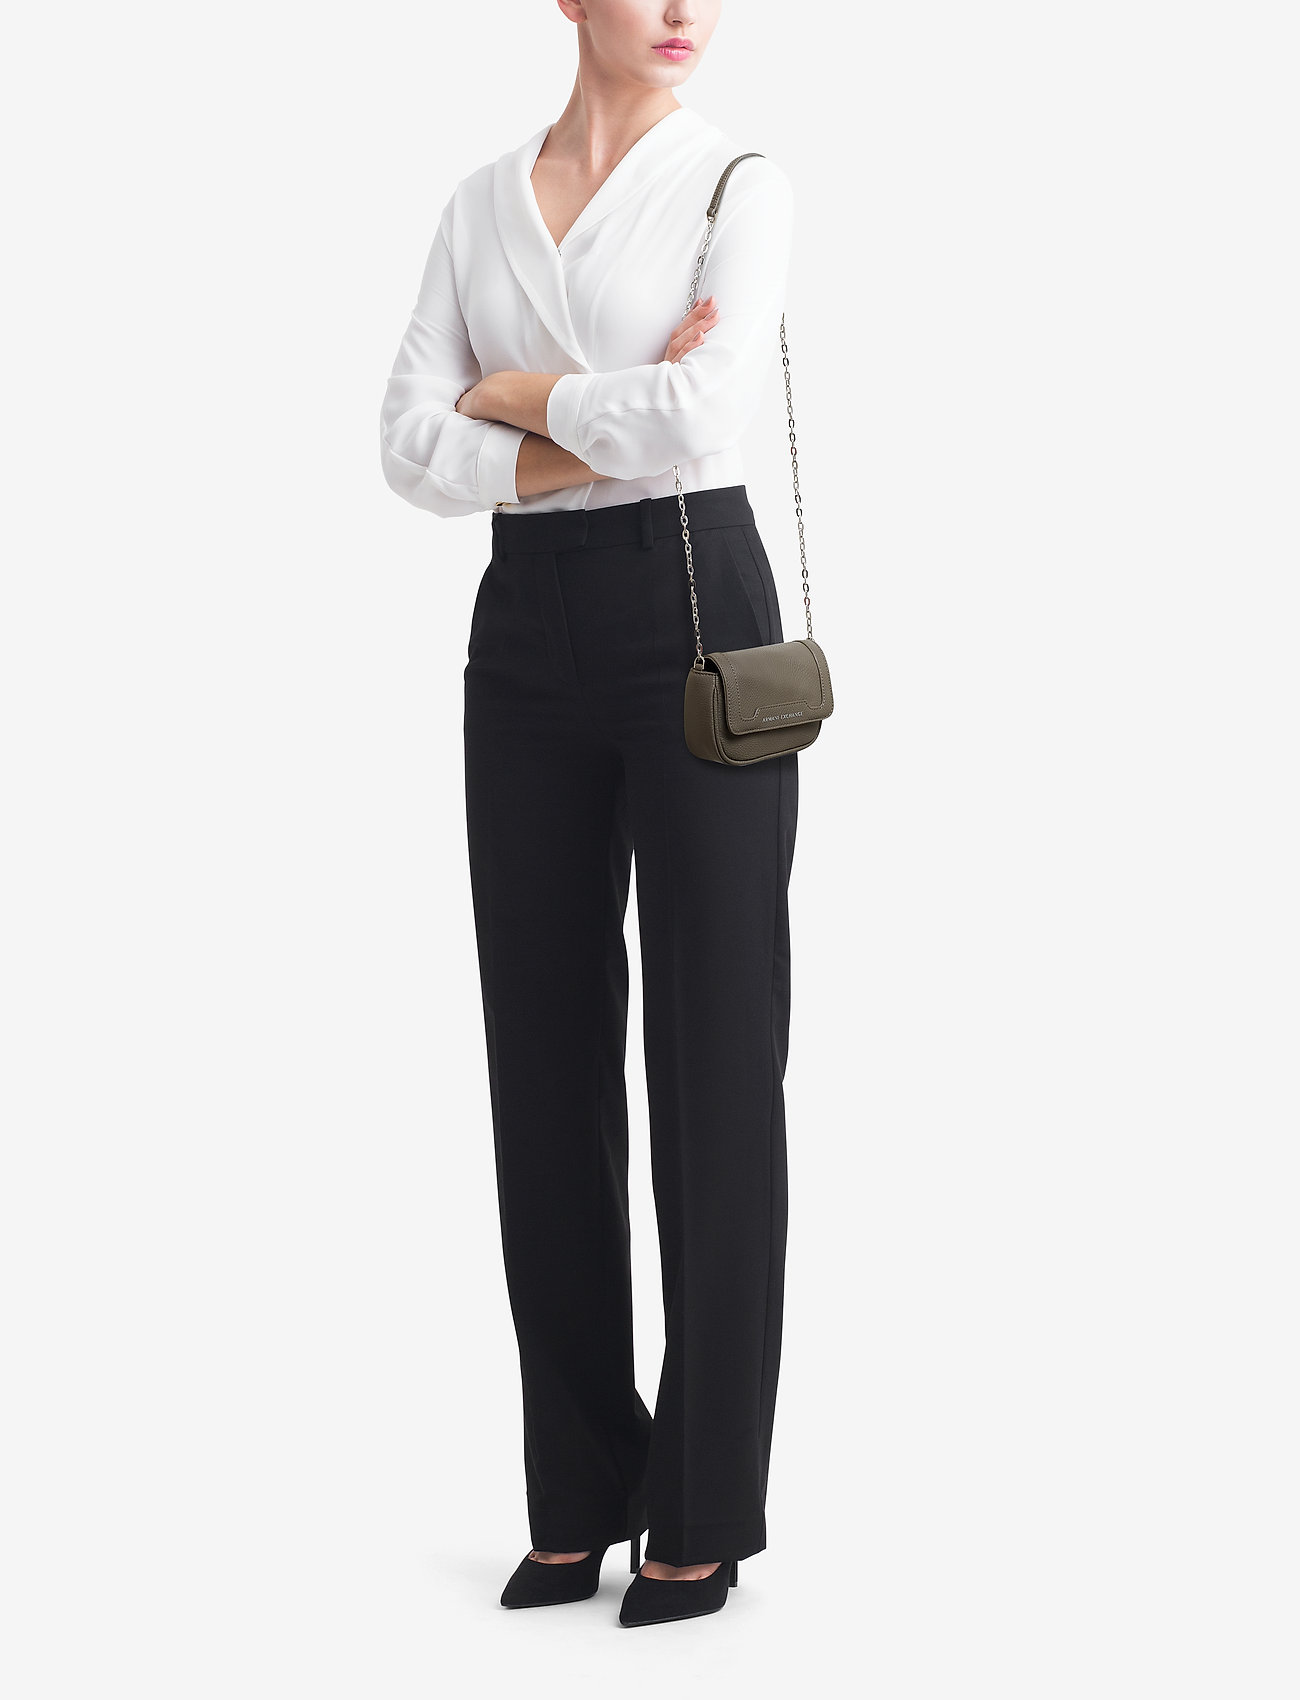 Armani Exchange WOMAN PVC/PLASTIC SHOULDER BAG - TAUPE